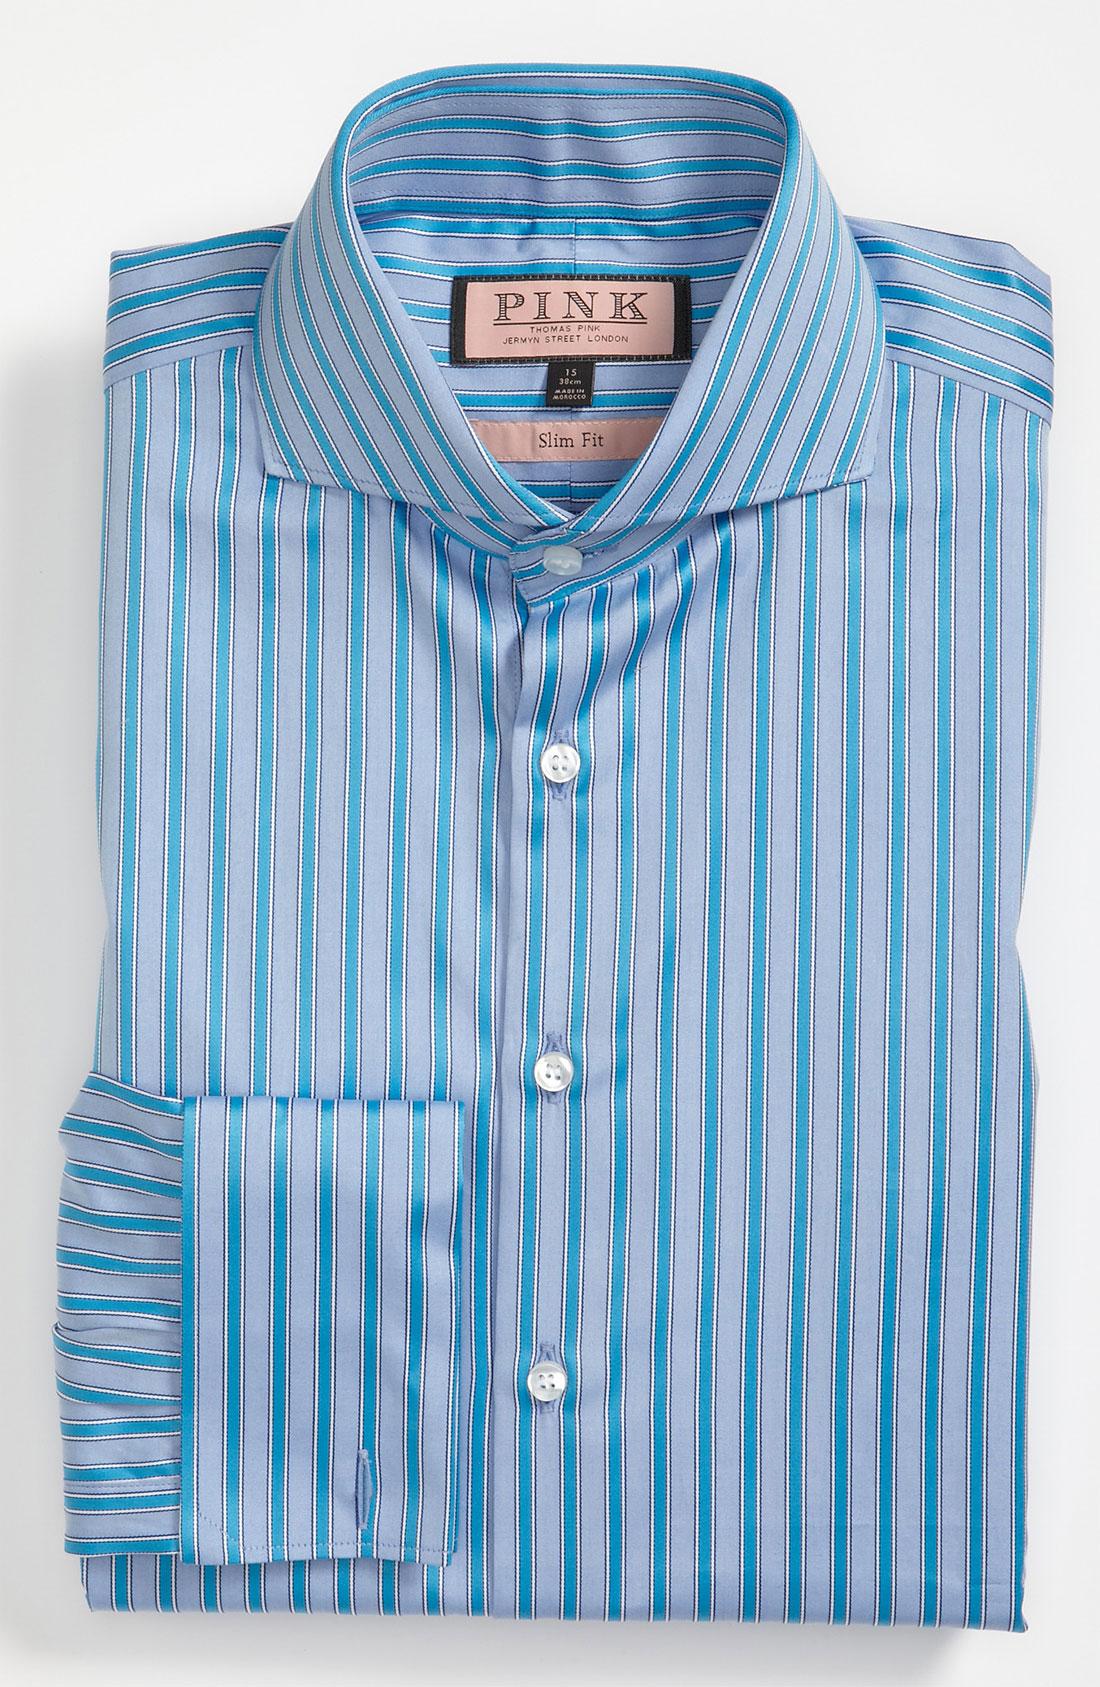 Thomas Pink Slim Fit Dress Shirt In Blue For Men Blue